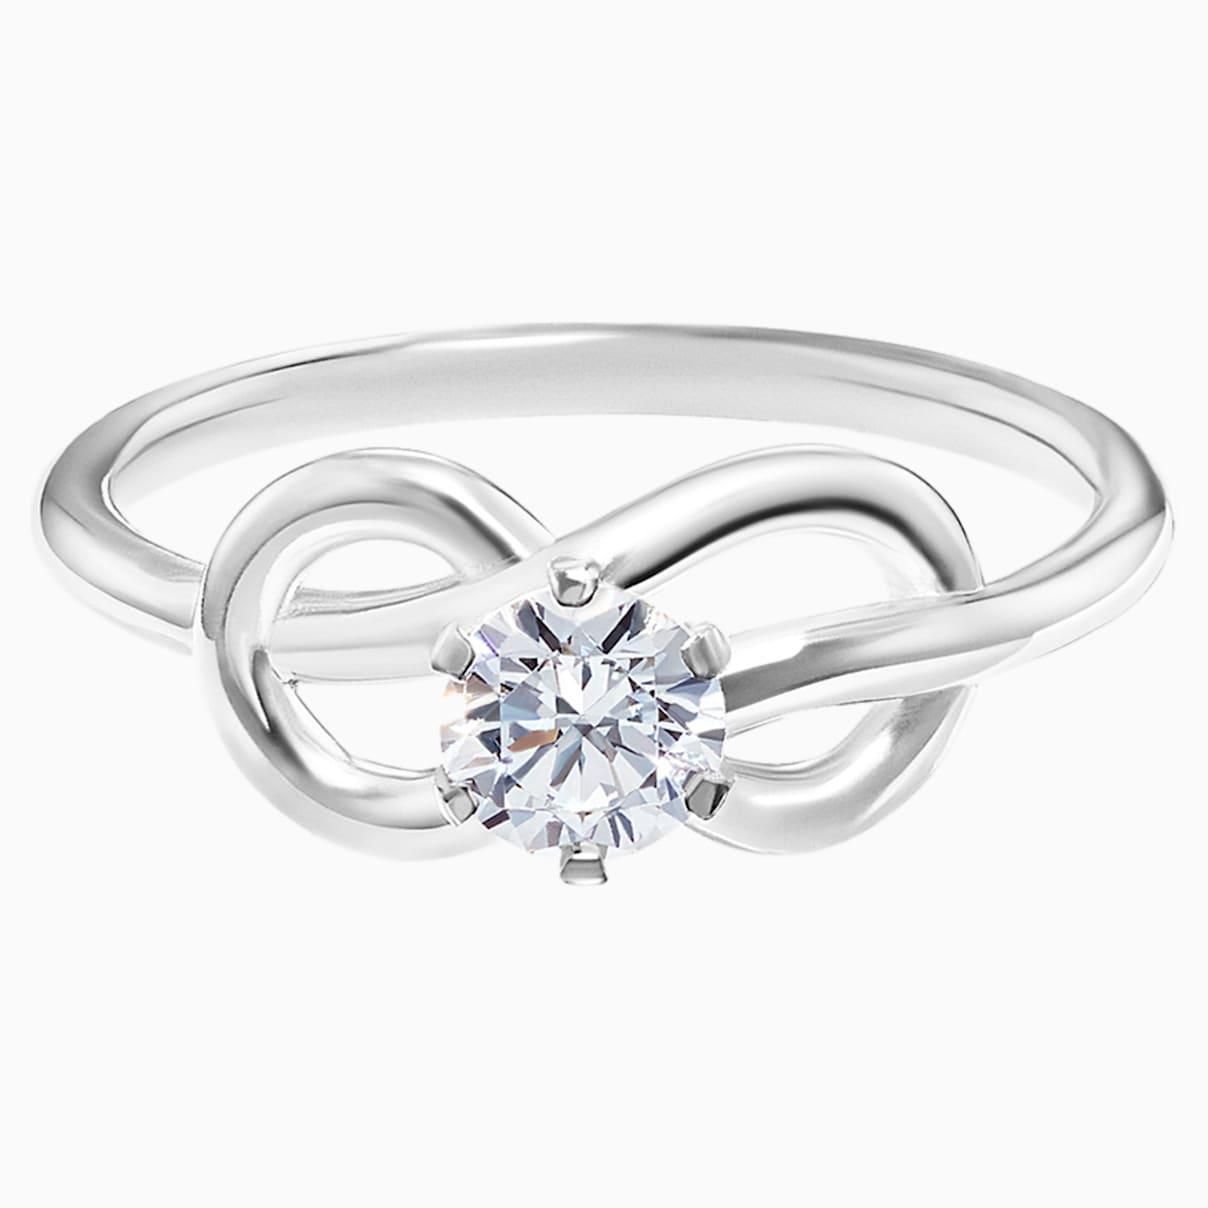 Knot of True Love Savoy Ring 0.25ct, Swarovski Created Diamonds, 18K White Gold, Size 52